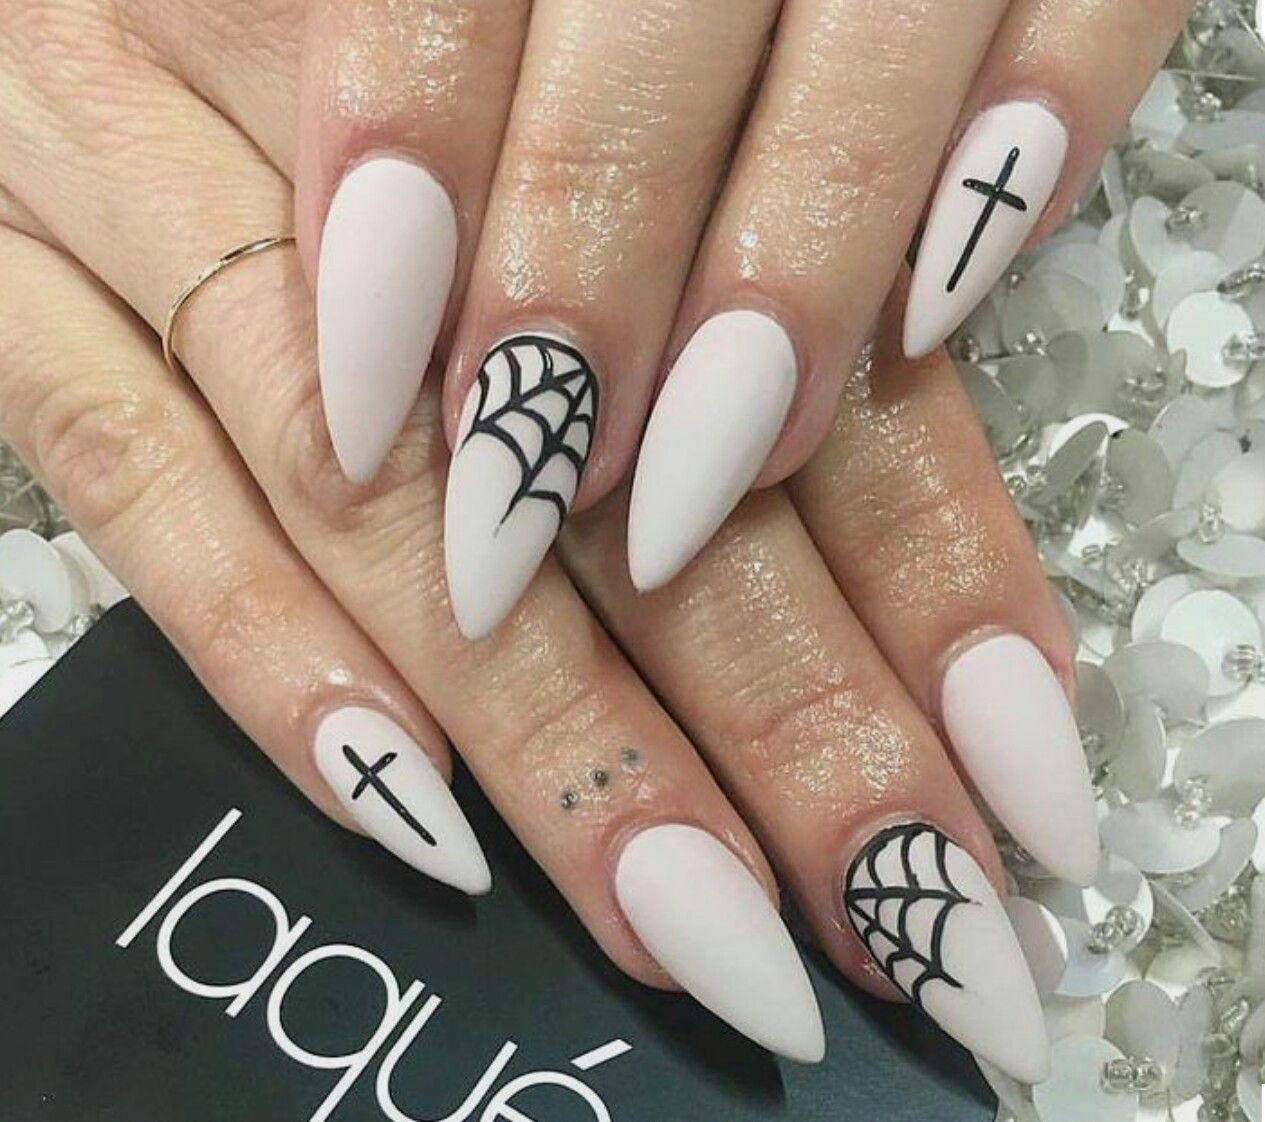 Helloween nail art ideas   nile designs 2018   Pinterest   Goth ...